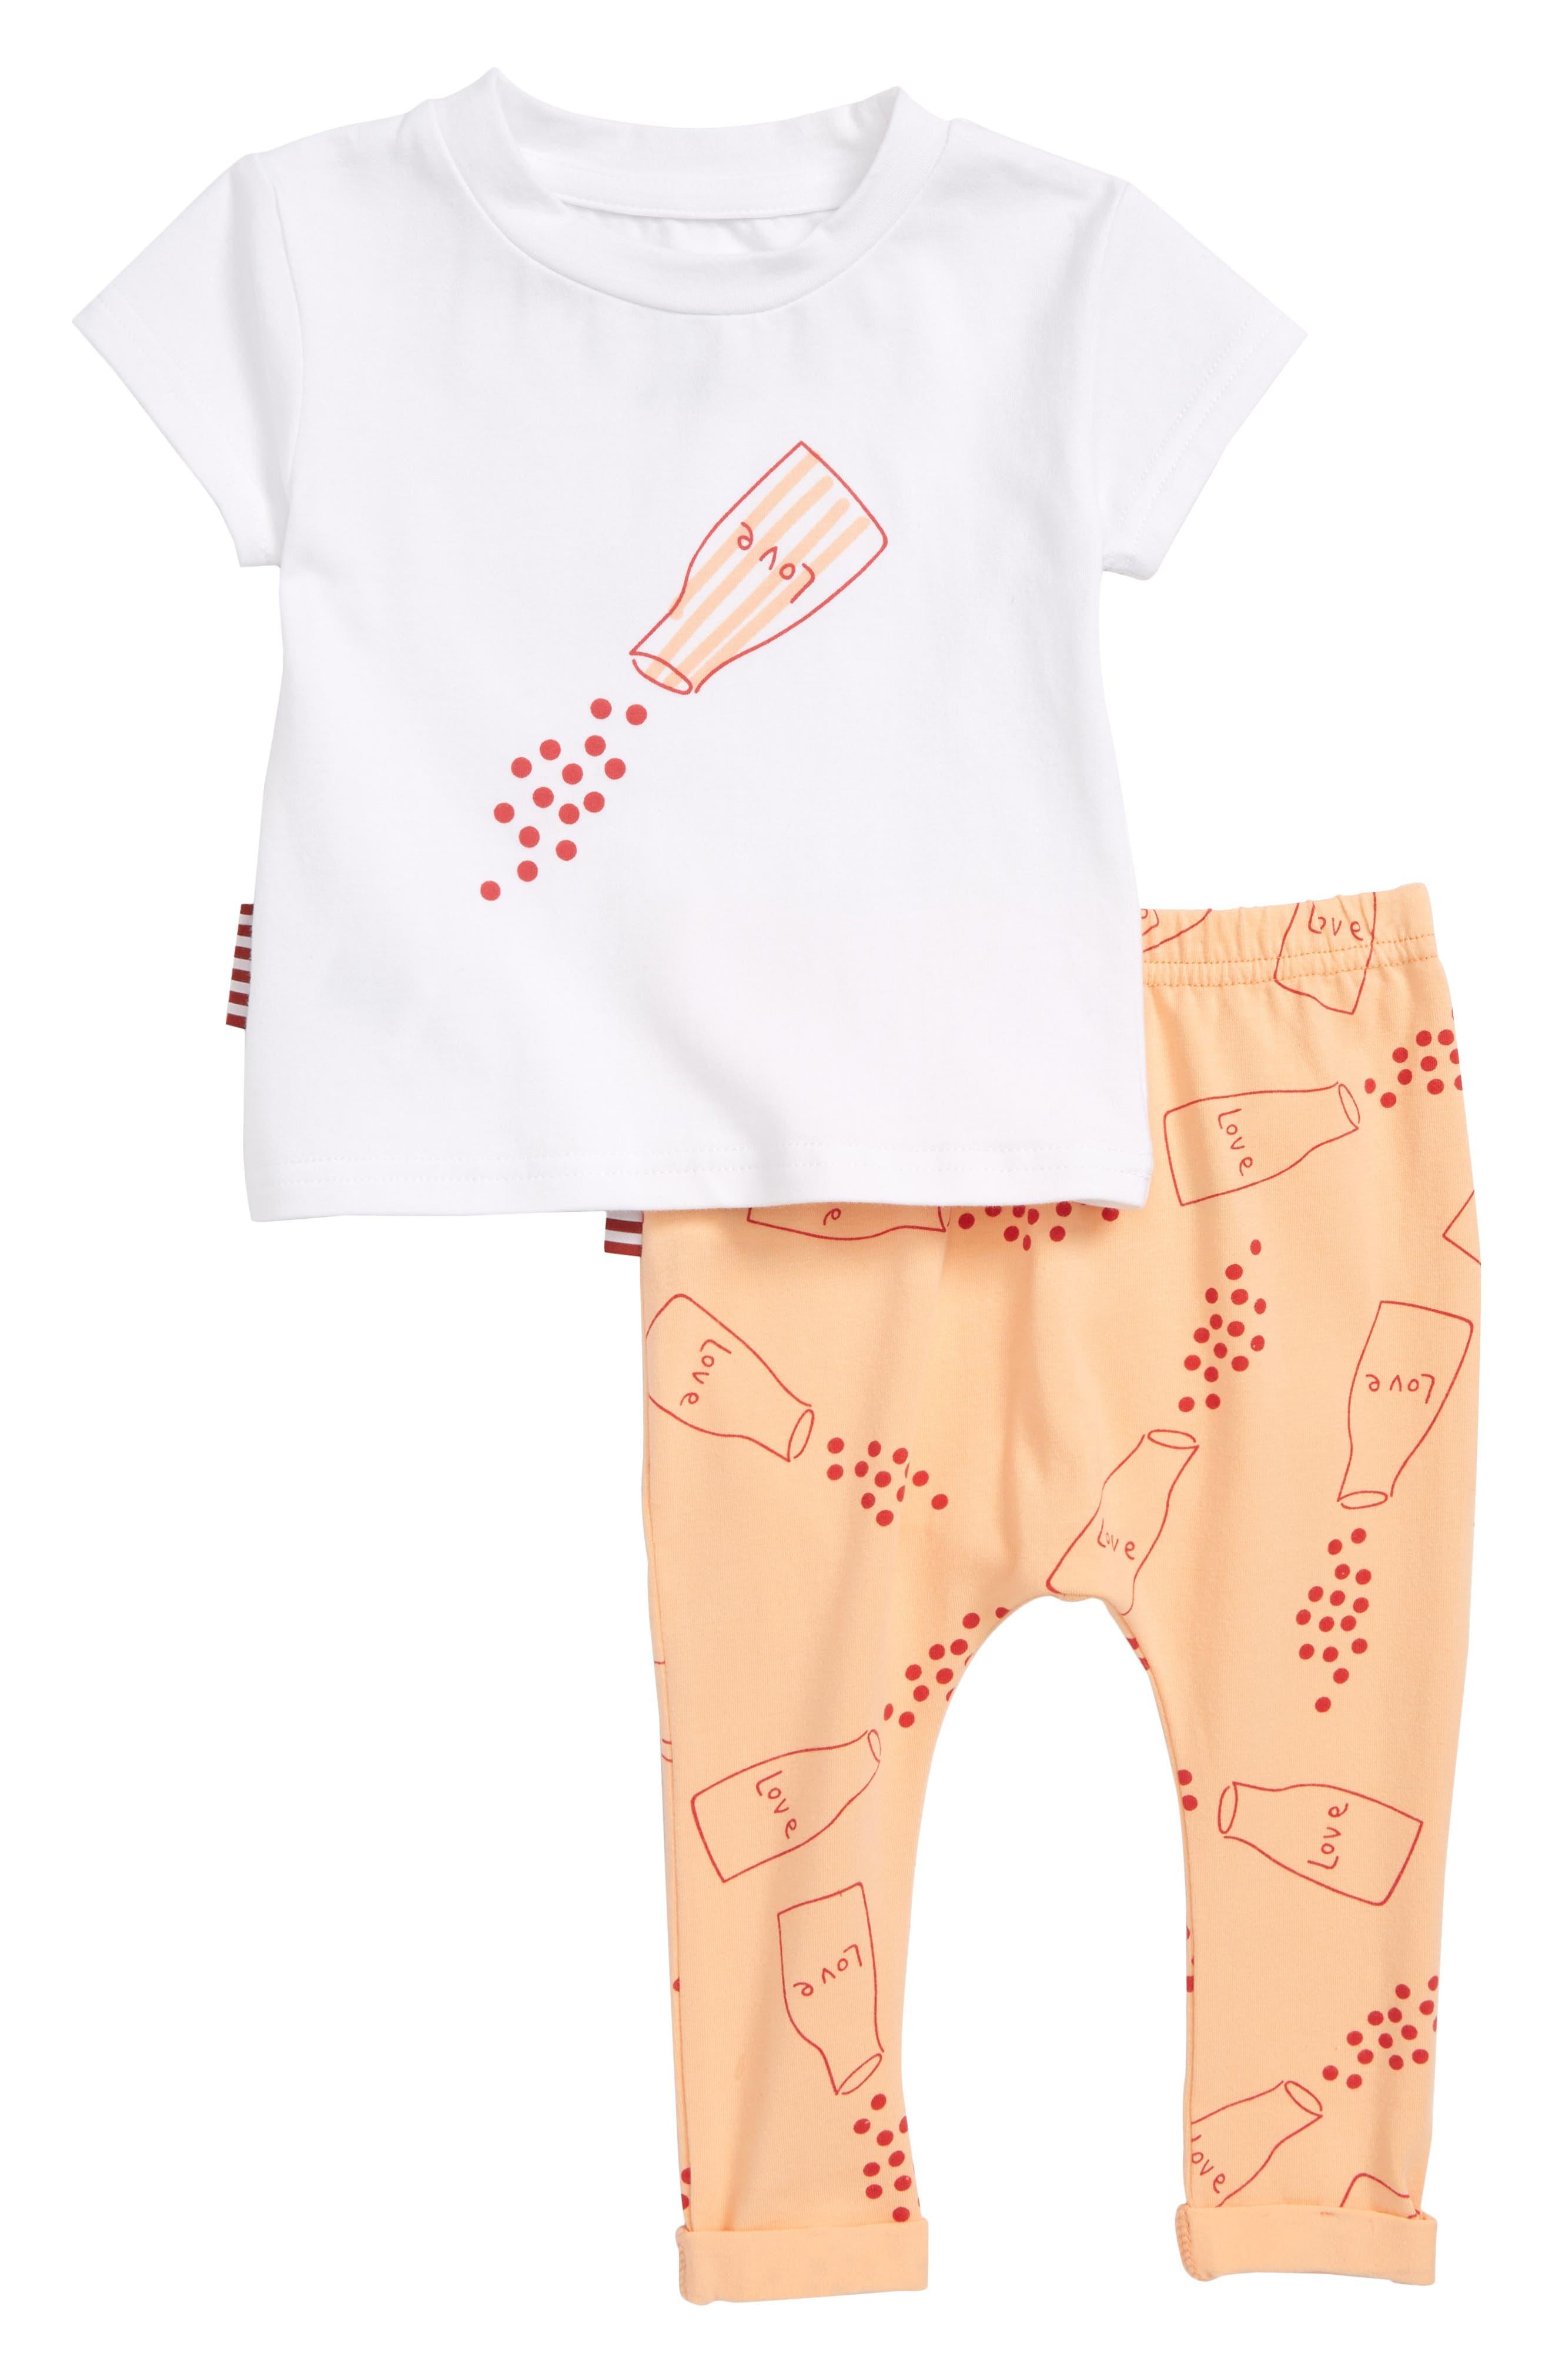 Sprinkle Love Print Tee & Leggings Set,                             Main thumbnail 1, color,                             White/ Peach